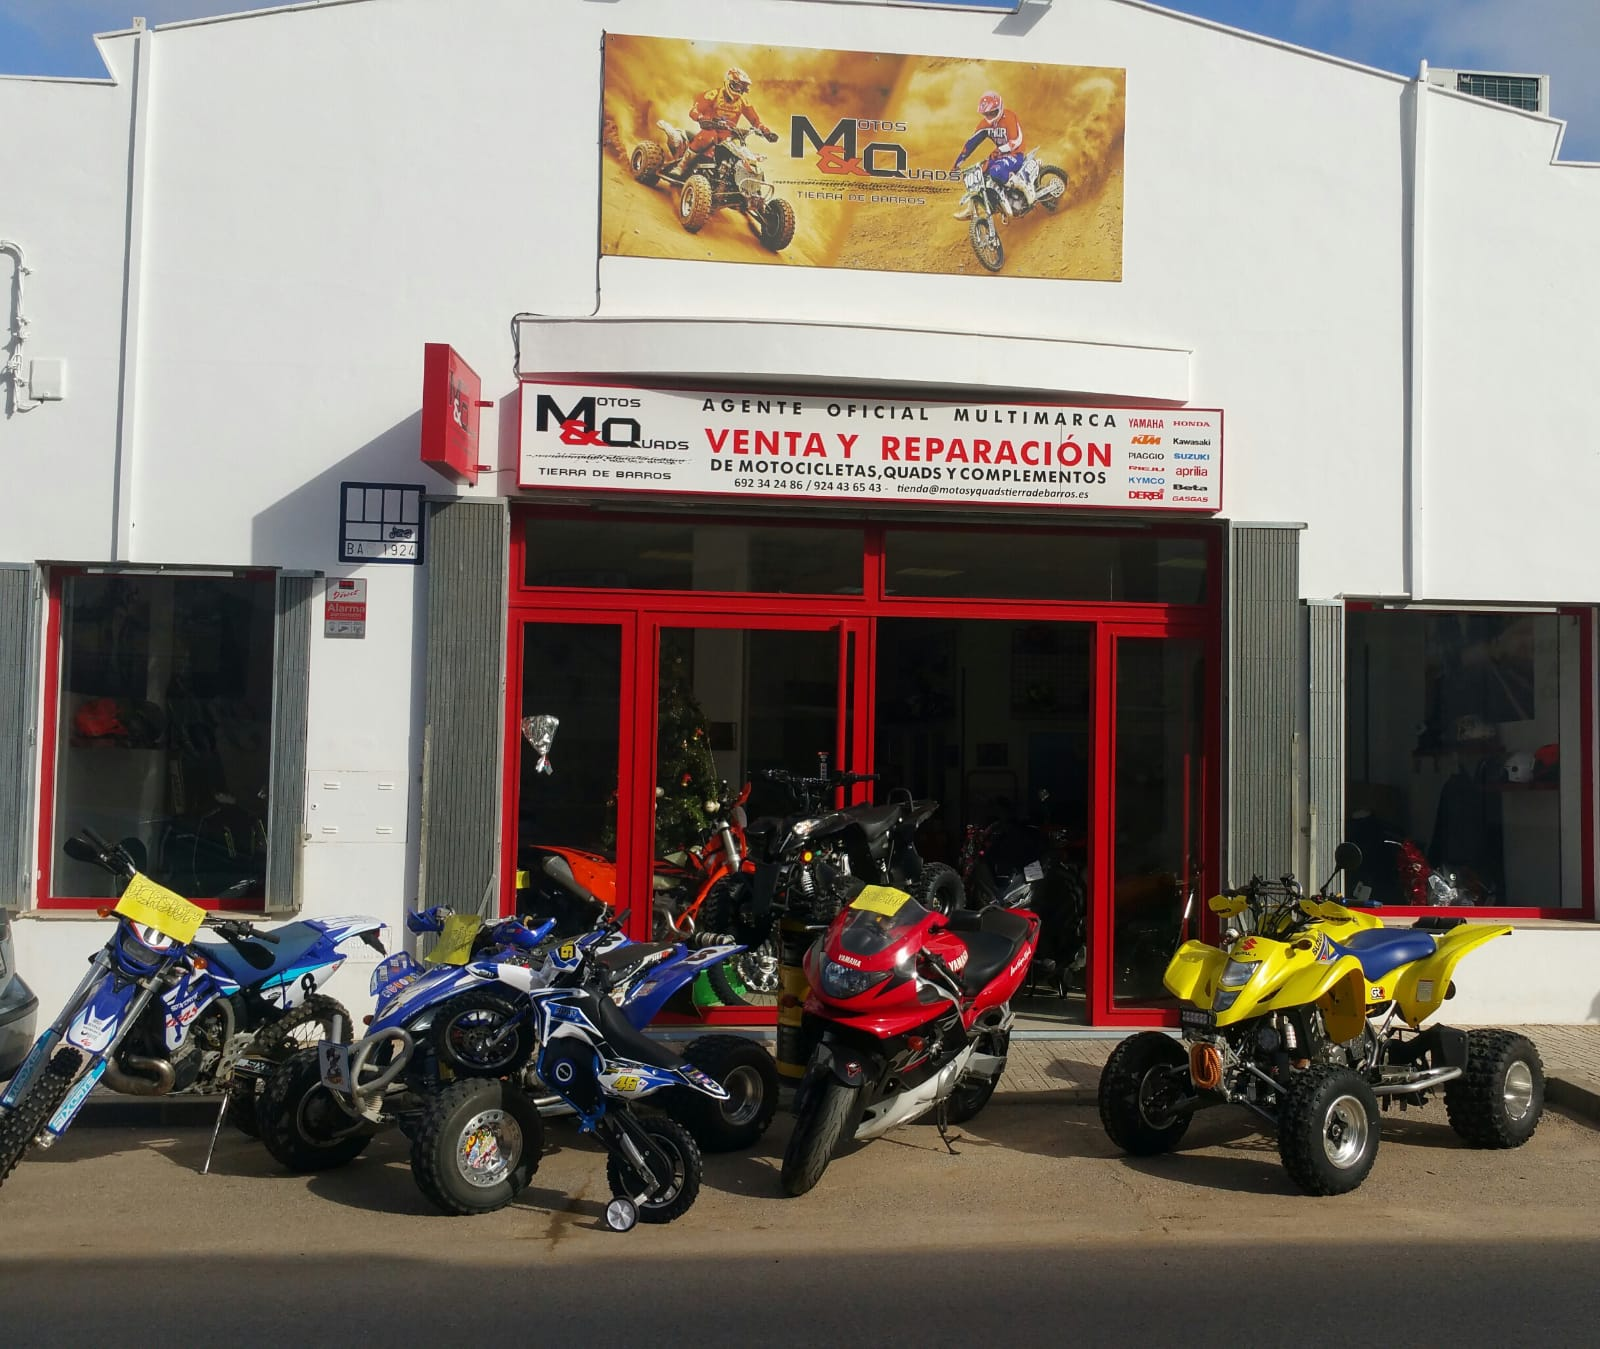 España Taller de motos en Almendralejo Quads Mq